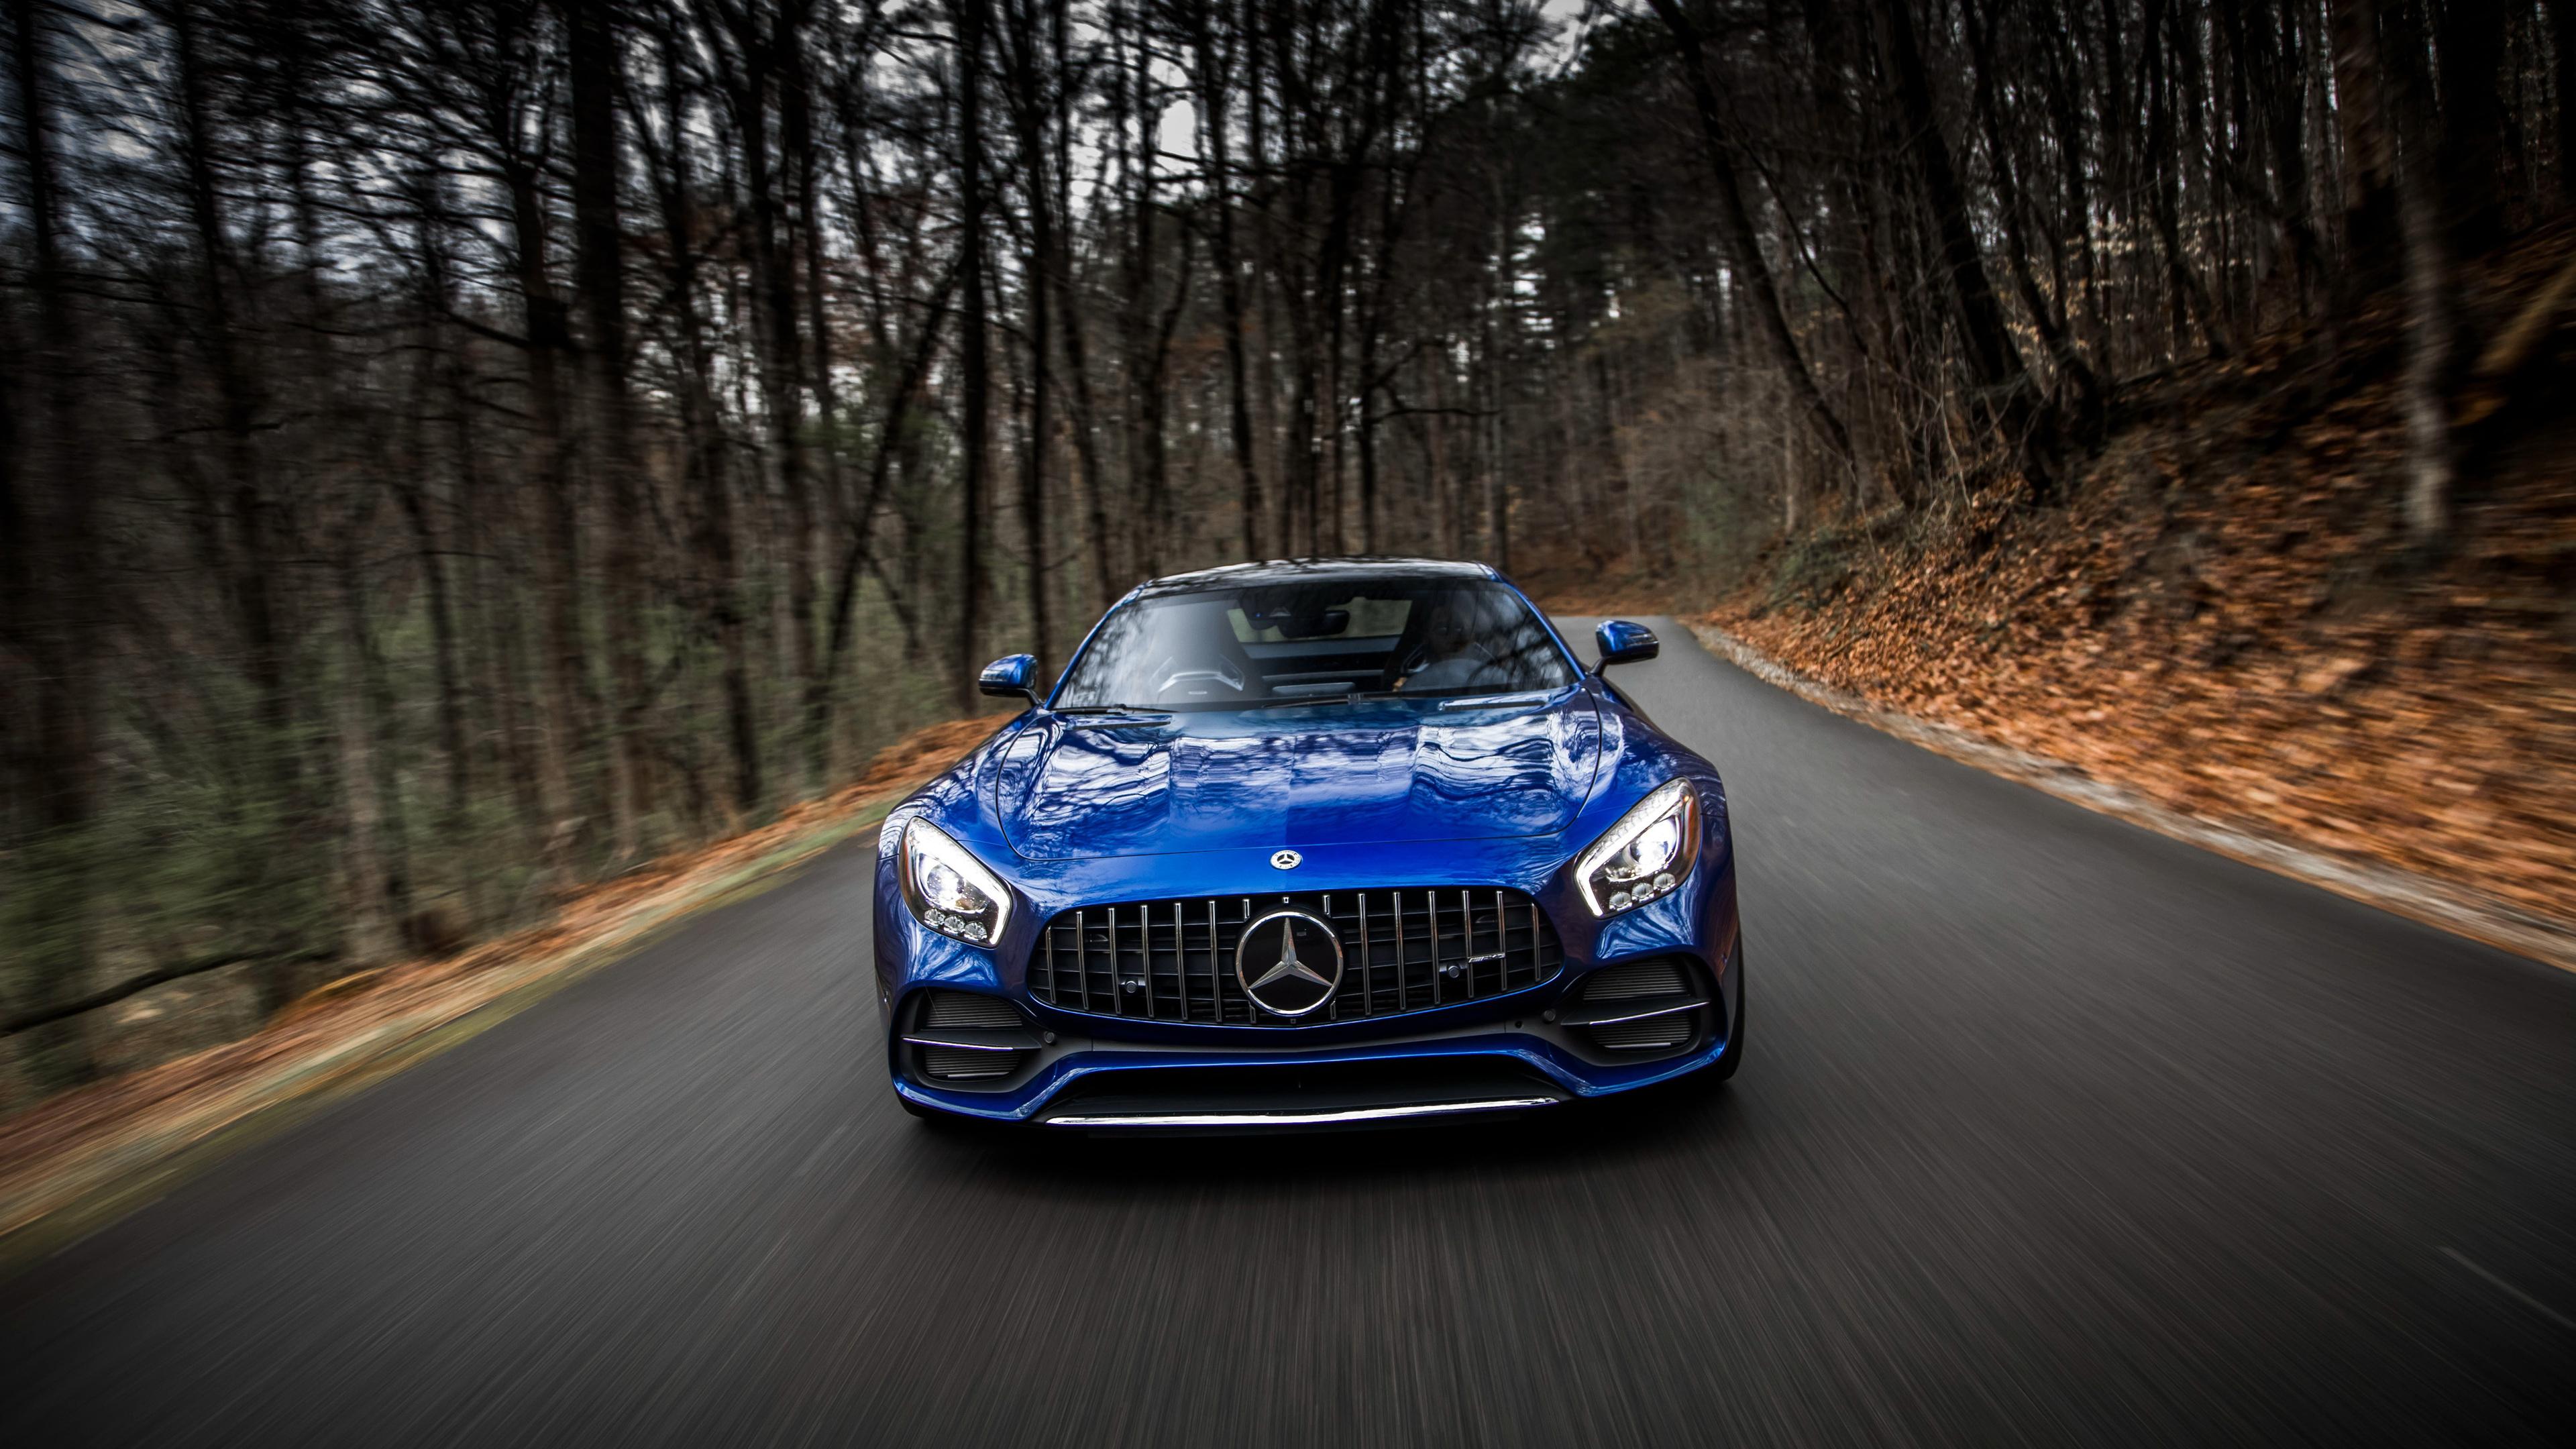 2018 mercedes amg gt c 4k 1539110653 - 2018 Mercedes AMG GT C 4k - mercedes wallpapers, mercedes amg gtc wallpapers, hd-wallpapers, cars wallpapers, 4k-wallpapers, 2018 cars wallpapers